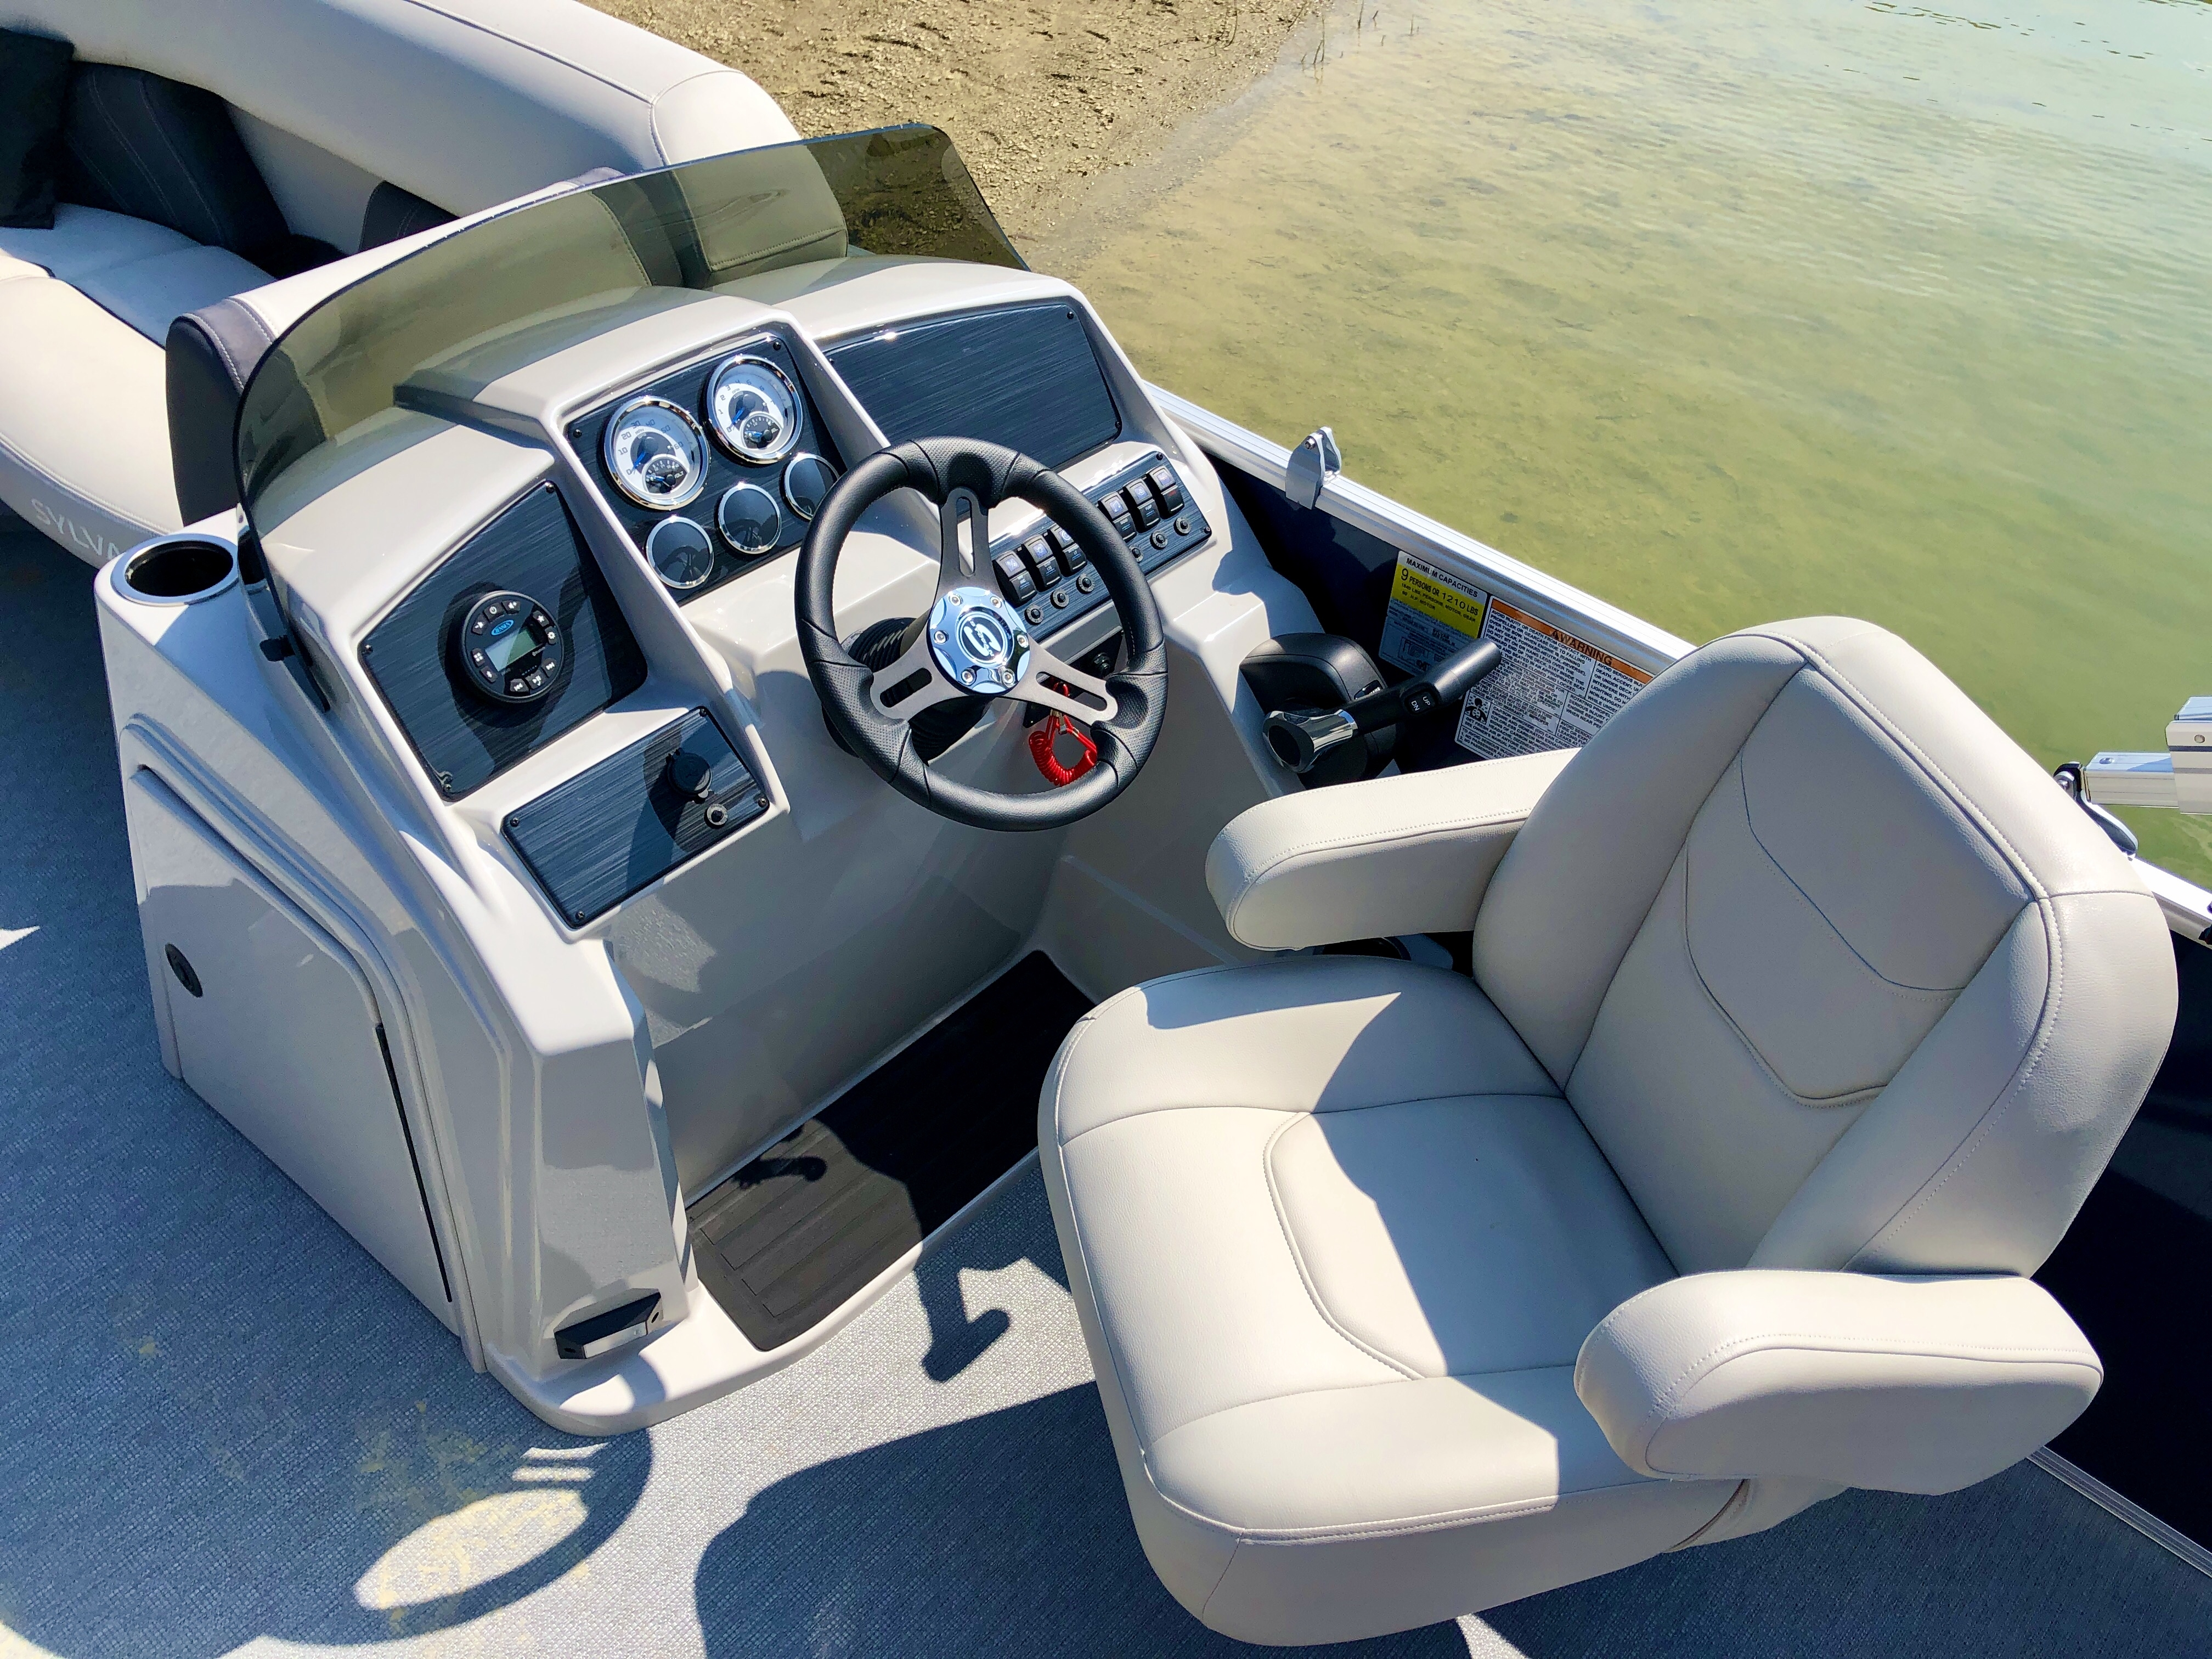 Boss Boat Rentals in Santa Rosa beach 30A Fl